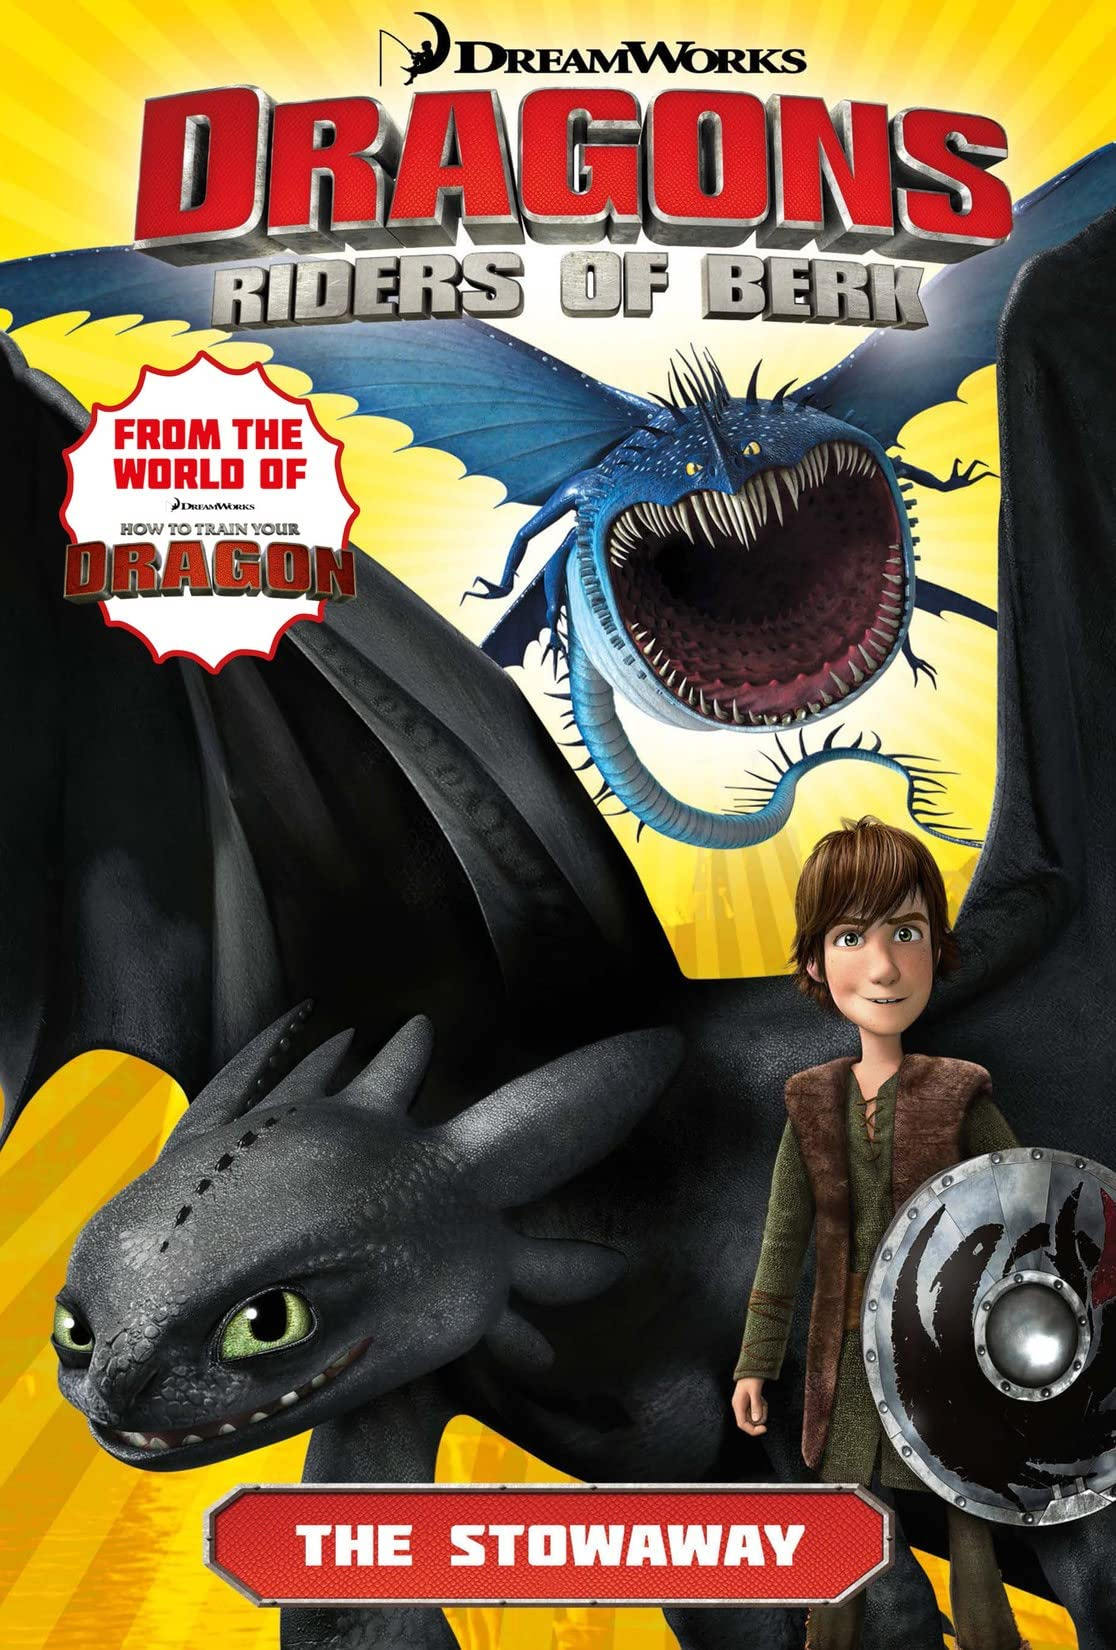 Dragons: Riders of Berk Vol. 4: The Stowaway